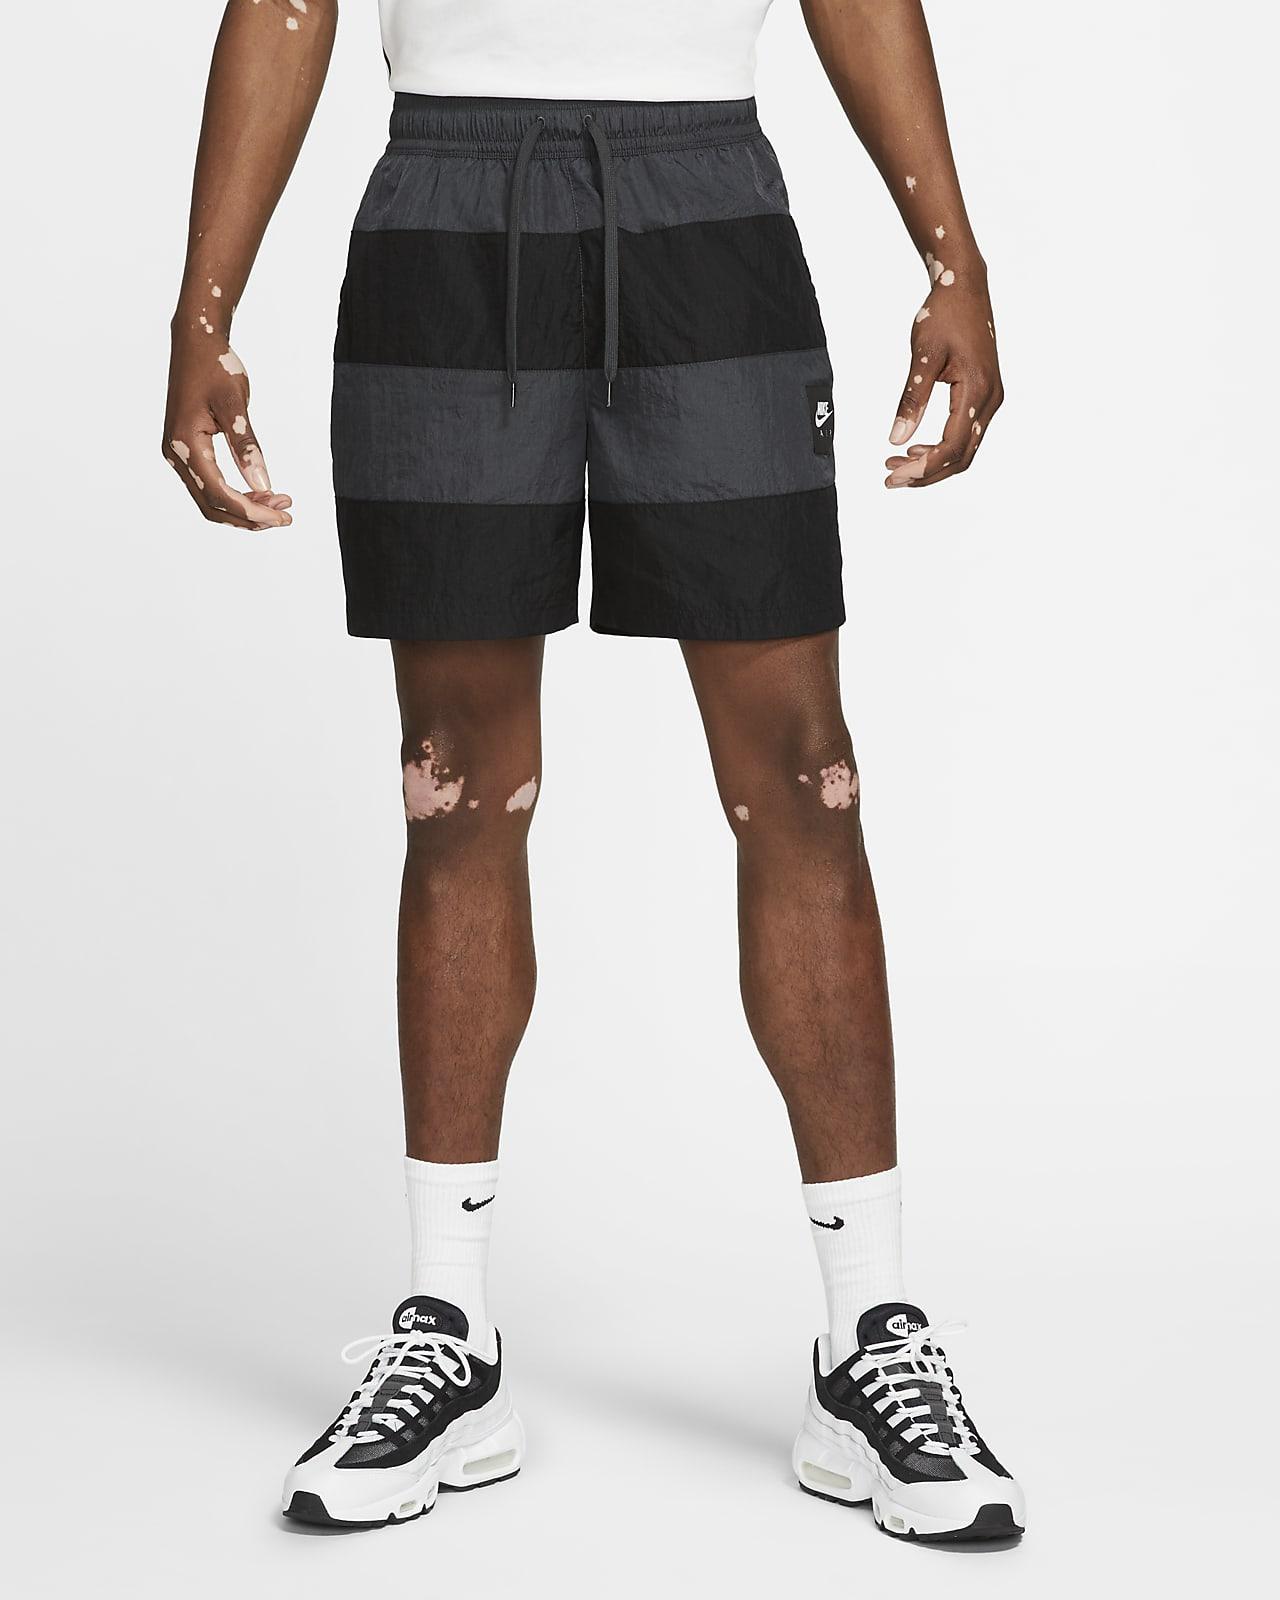 Nike Air Men's Woven Shorts